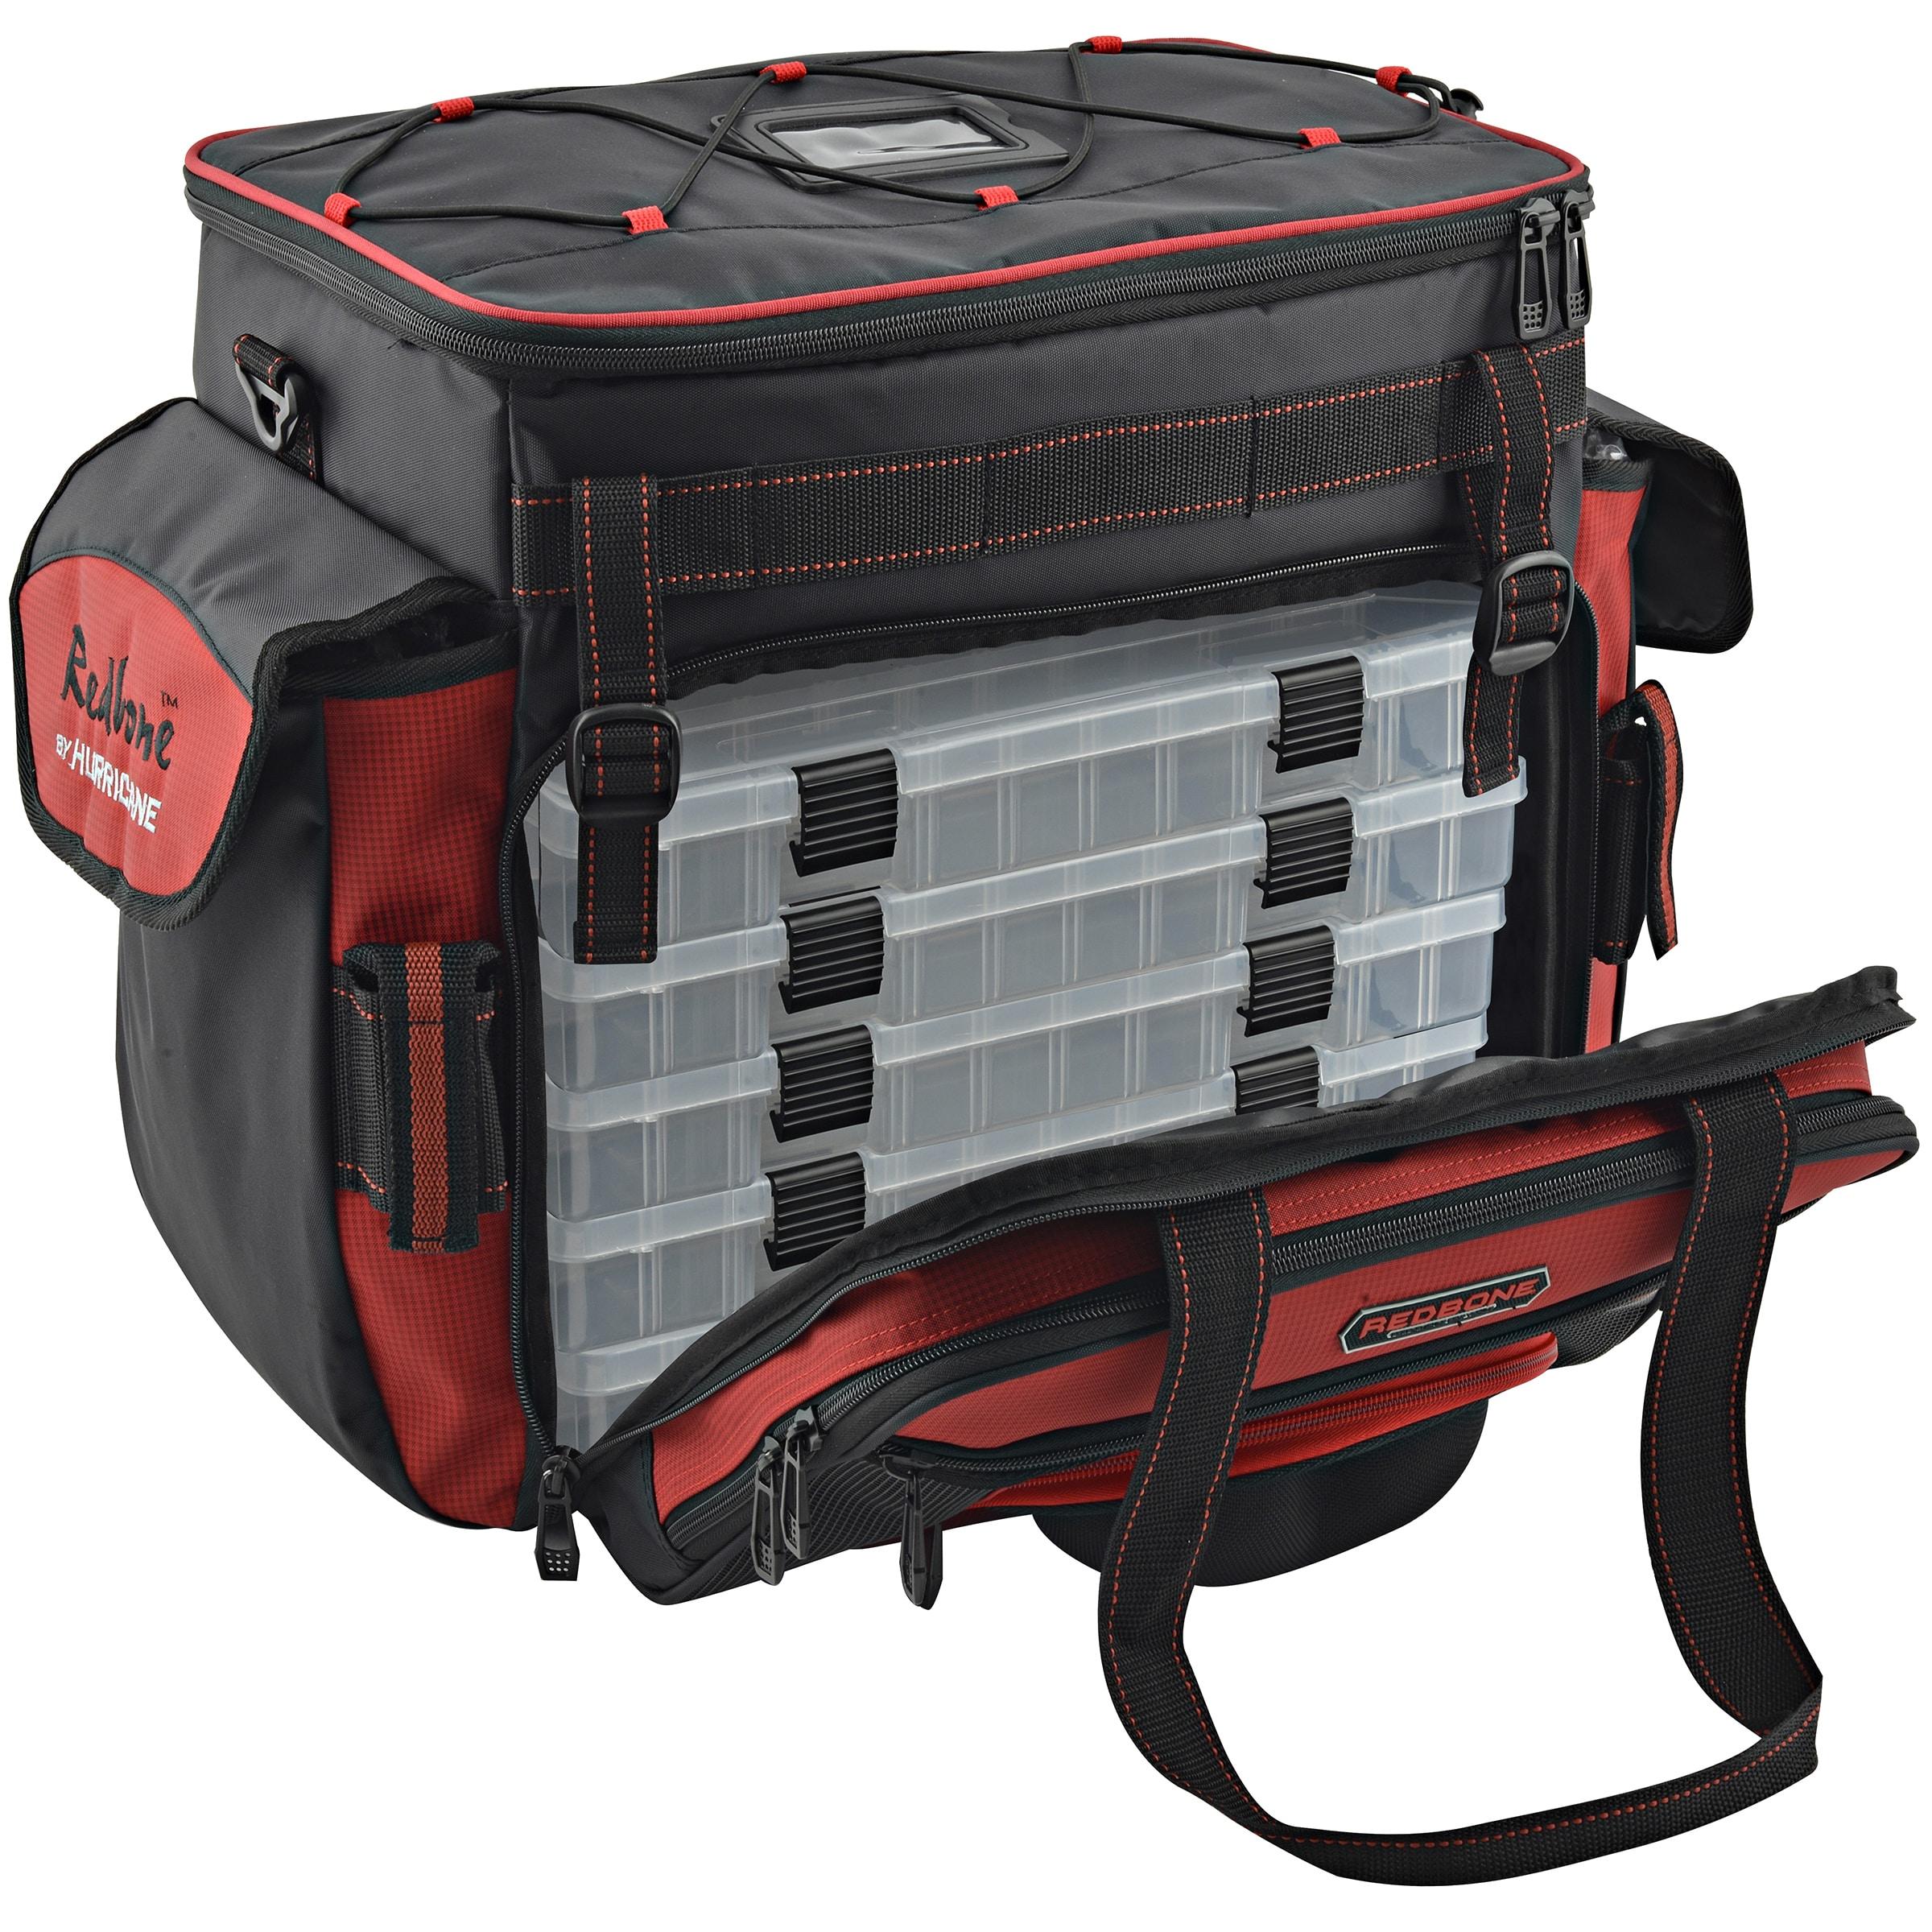 Redbone Performance Softsided Tackle Bag Free Shipping Today 10186538